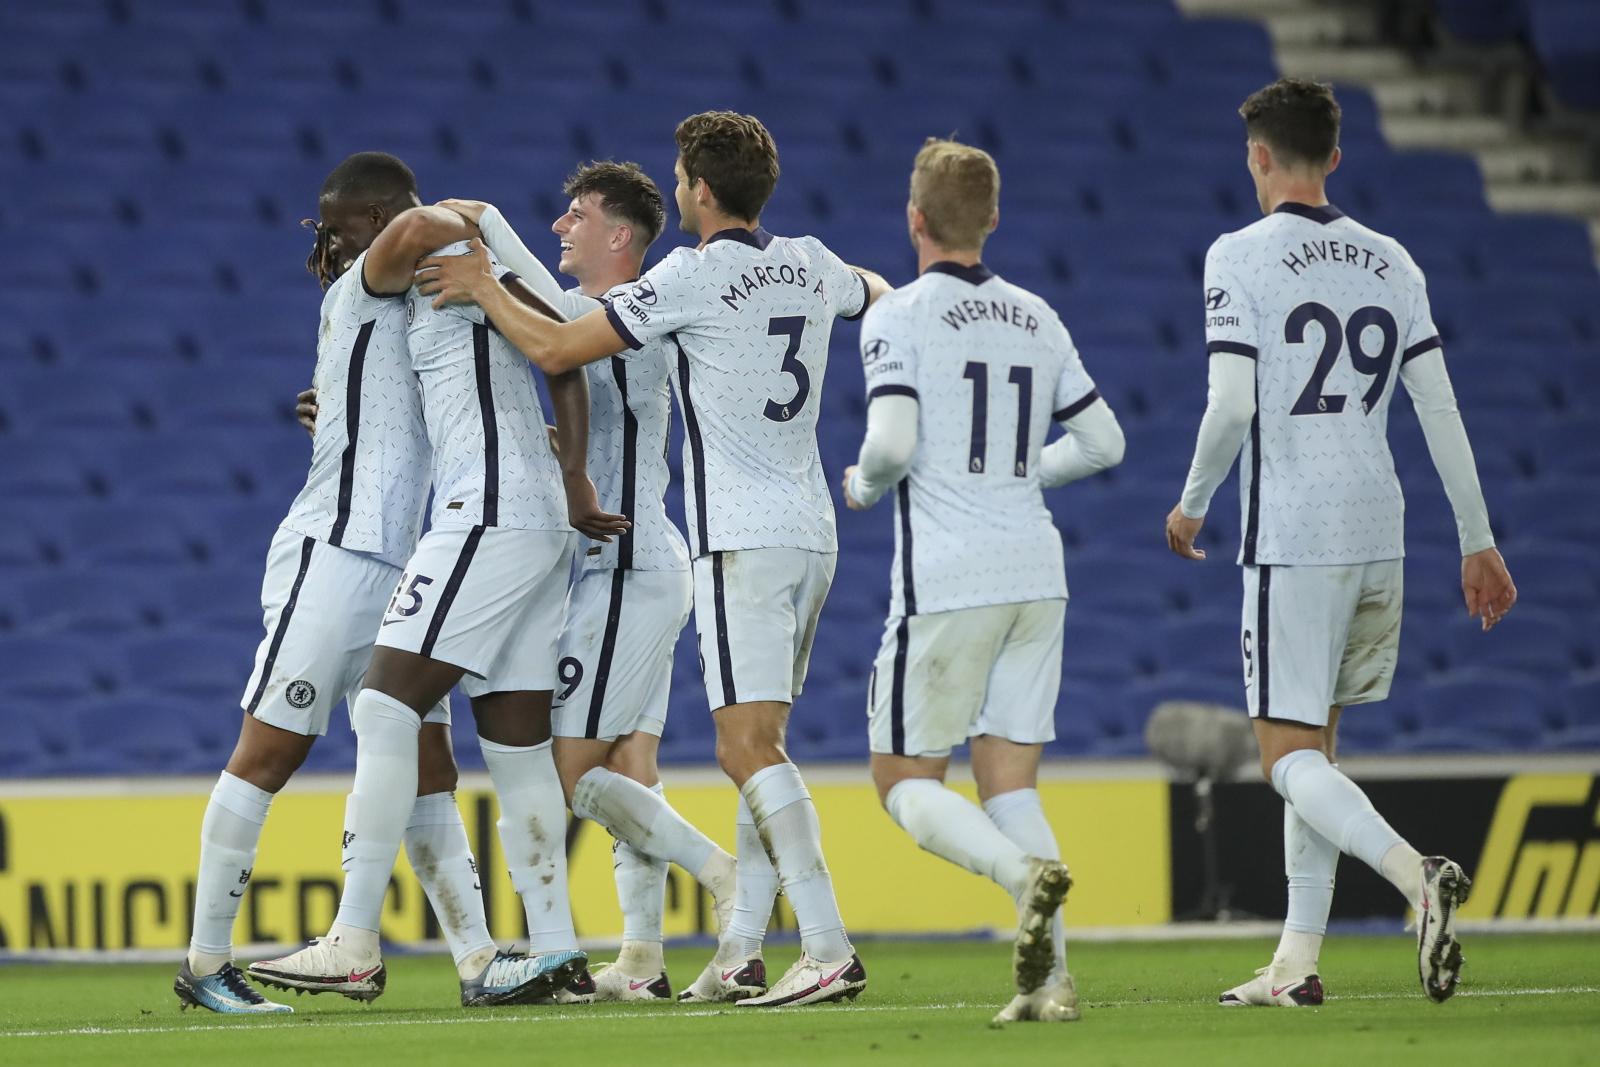 Premier League: Chelsea FC wygrała z Brighton and Hove Albion. Timo Werner i Kai Havertz postawili pierwsze kroki - Sport WP SportoweFakty